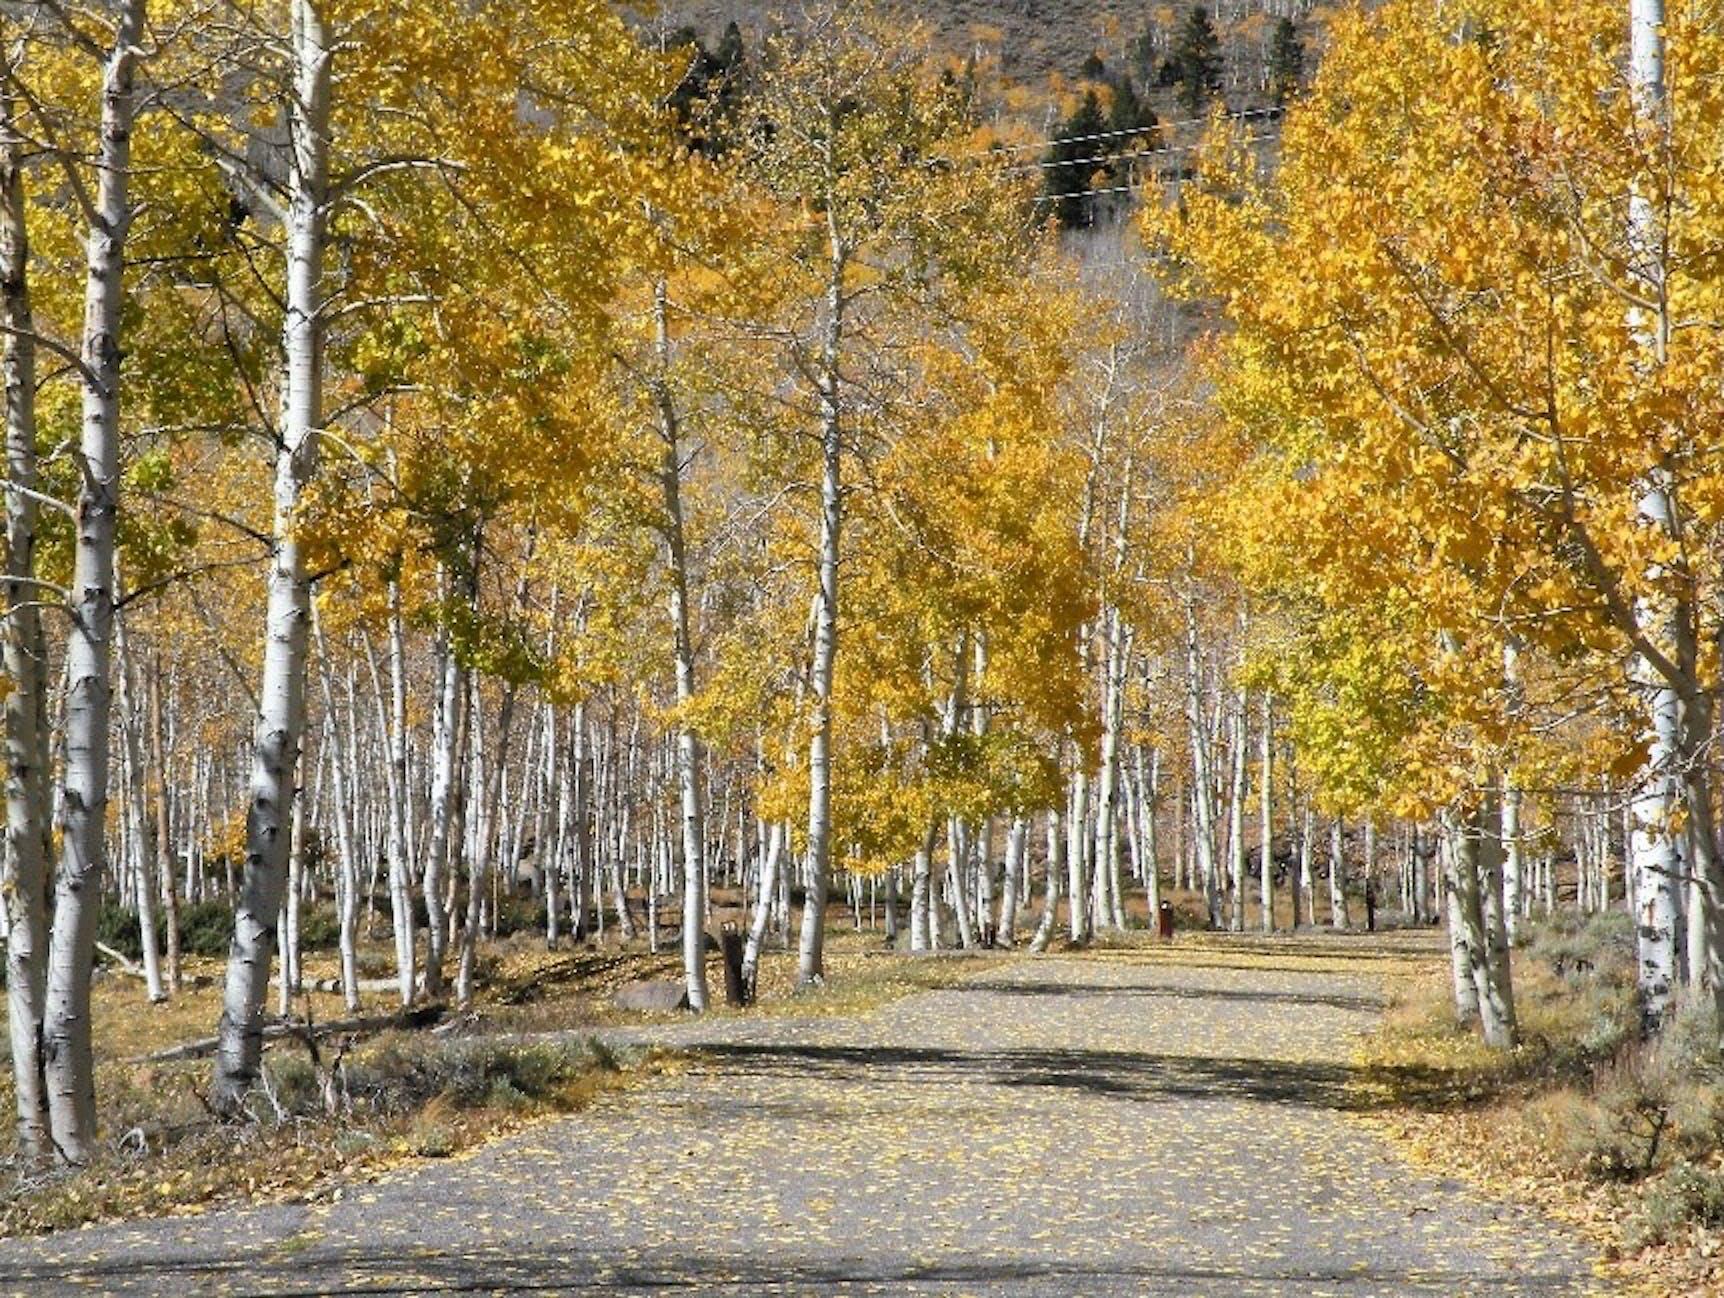 Pando Grove in fall foliage at Dr. Creek Campground, Utah.